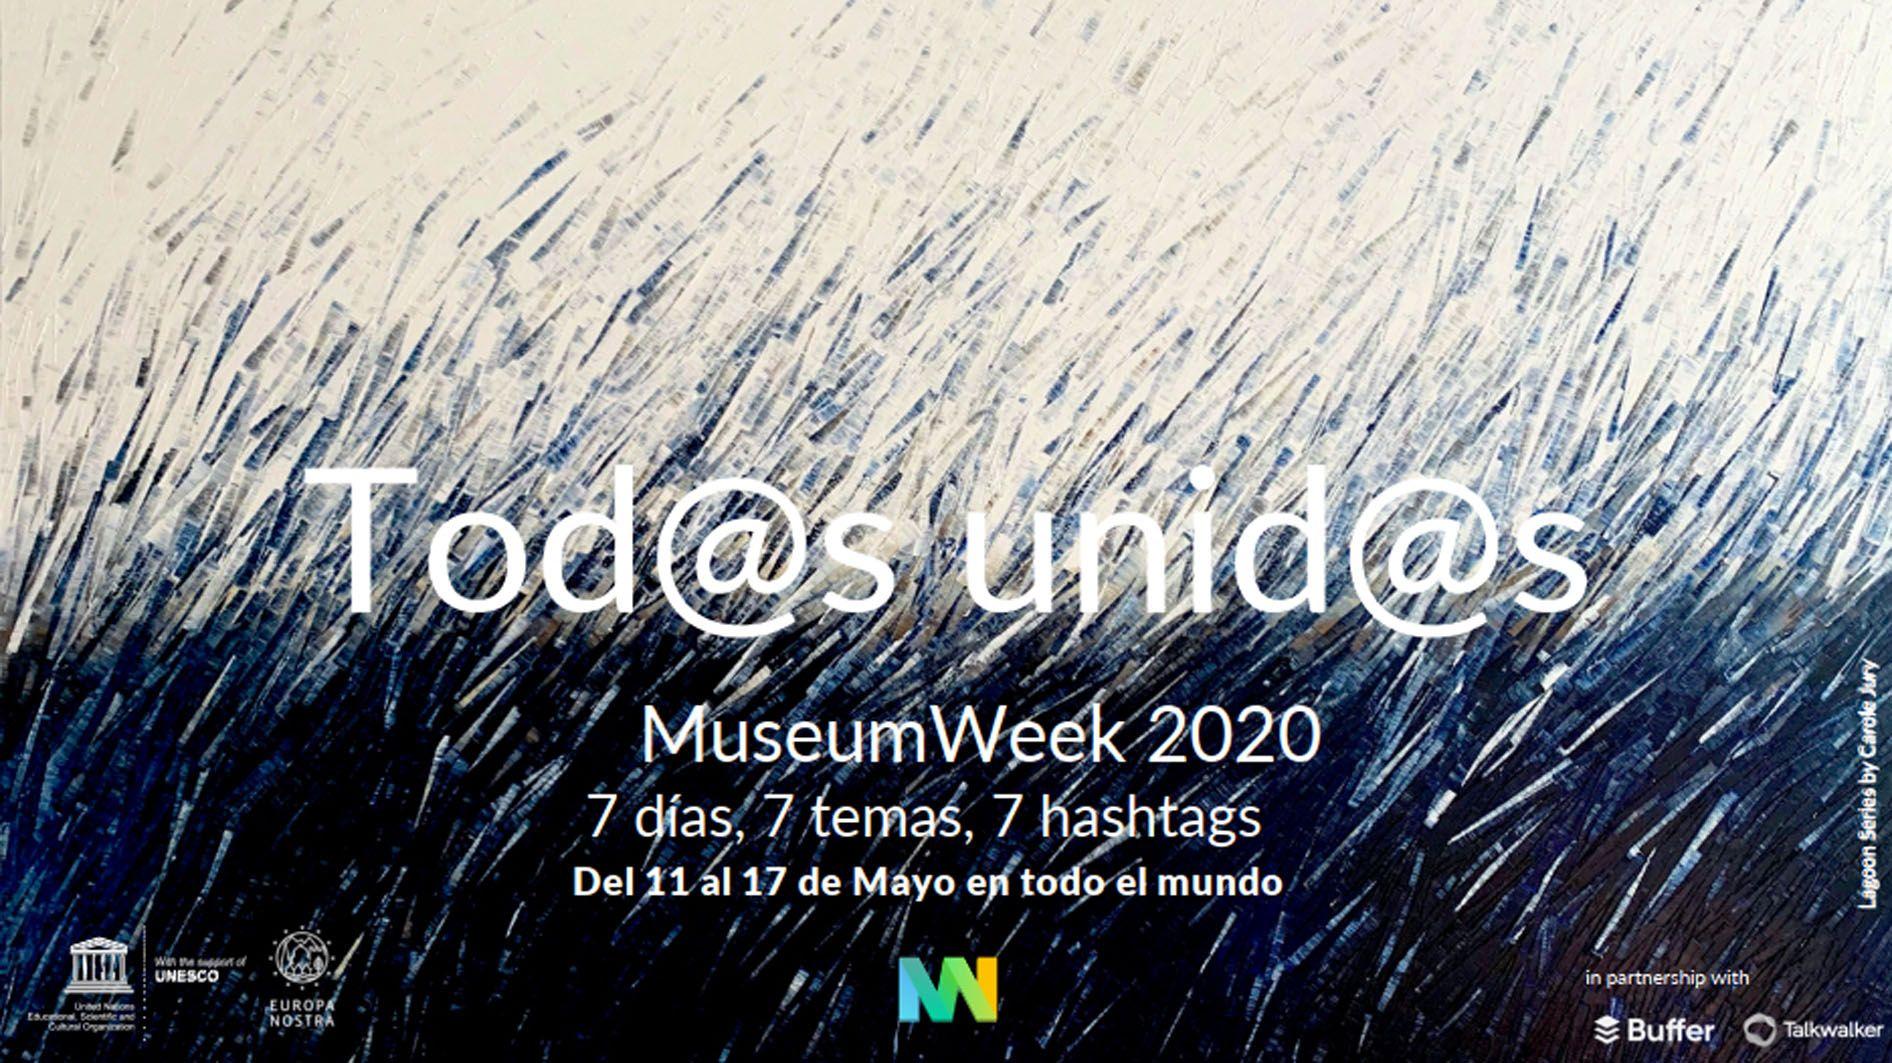 Museumweek